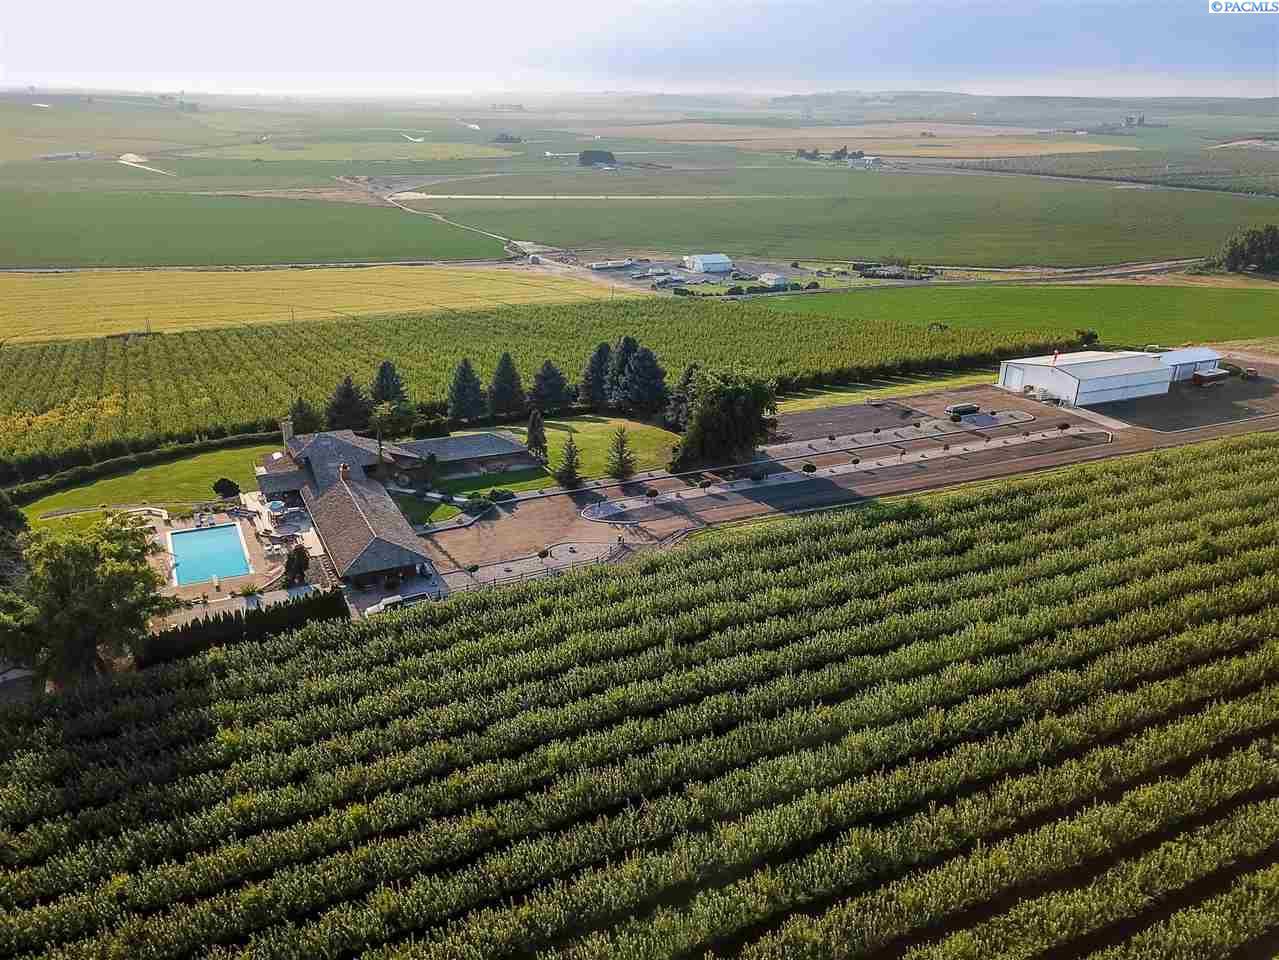 Farm / Ranch / Plantation for Sale at 11549 Road E SW Royal City, Washington 99357 United States